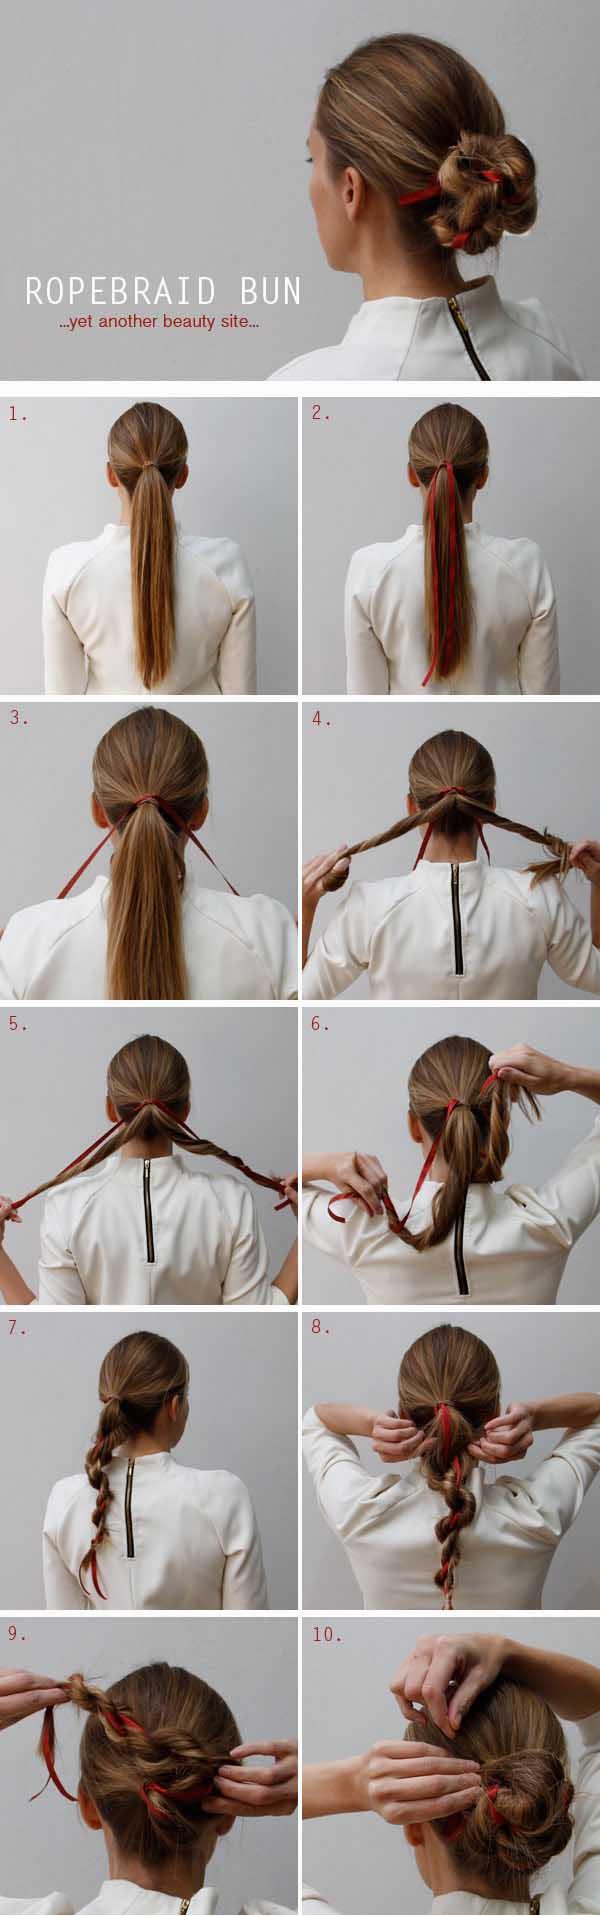 15 Spectacular Hairstyle Ideas Hair Tutorial Hair Styles Cute Everyday Hairstyles